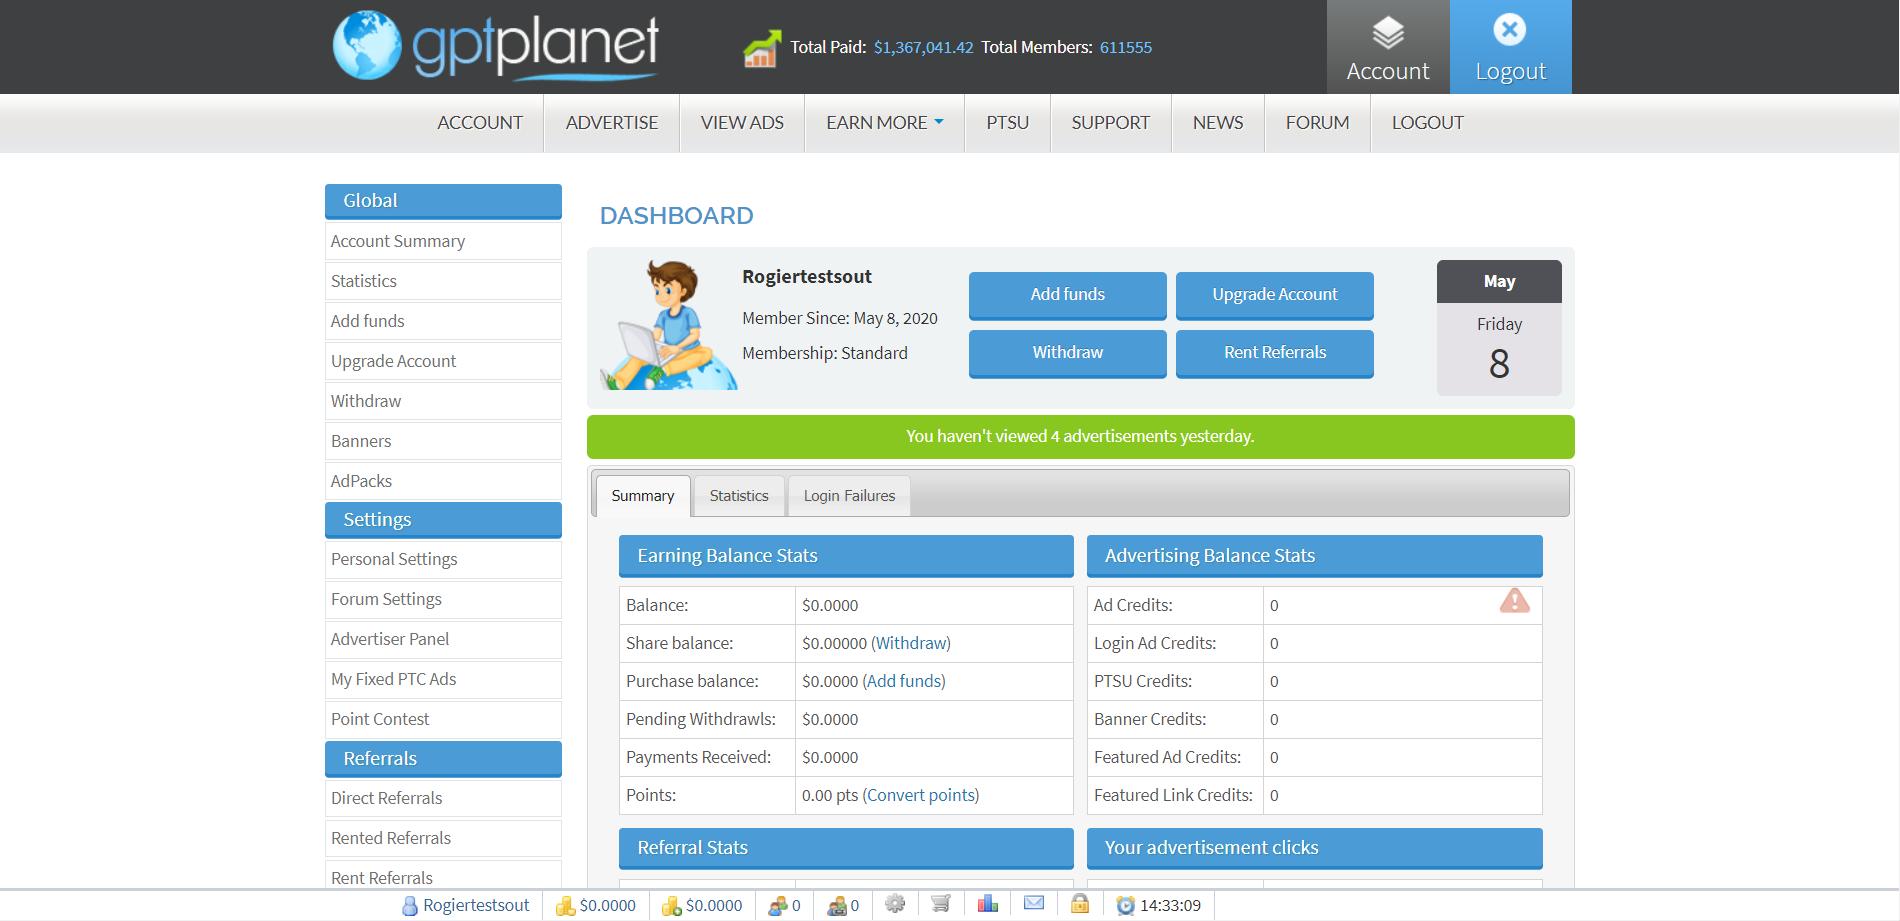 GPTplanet dashboard